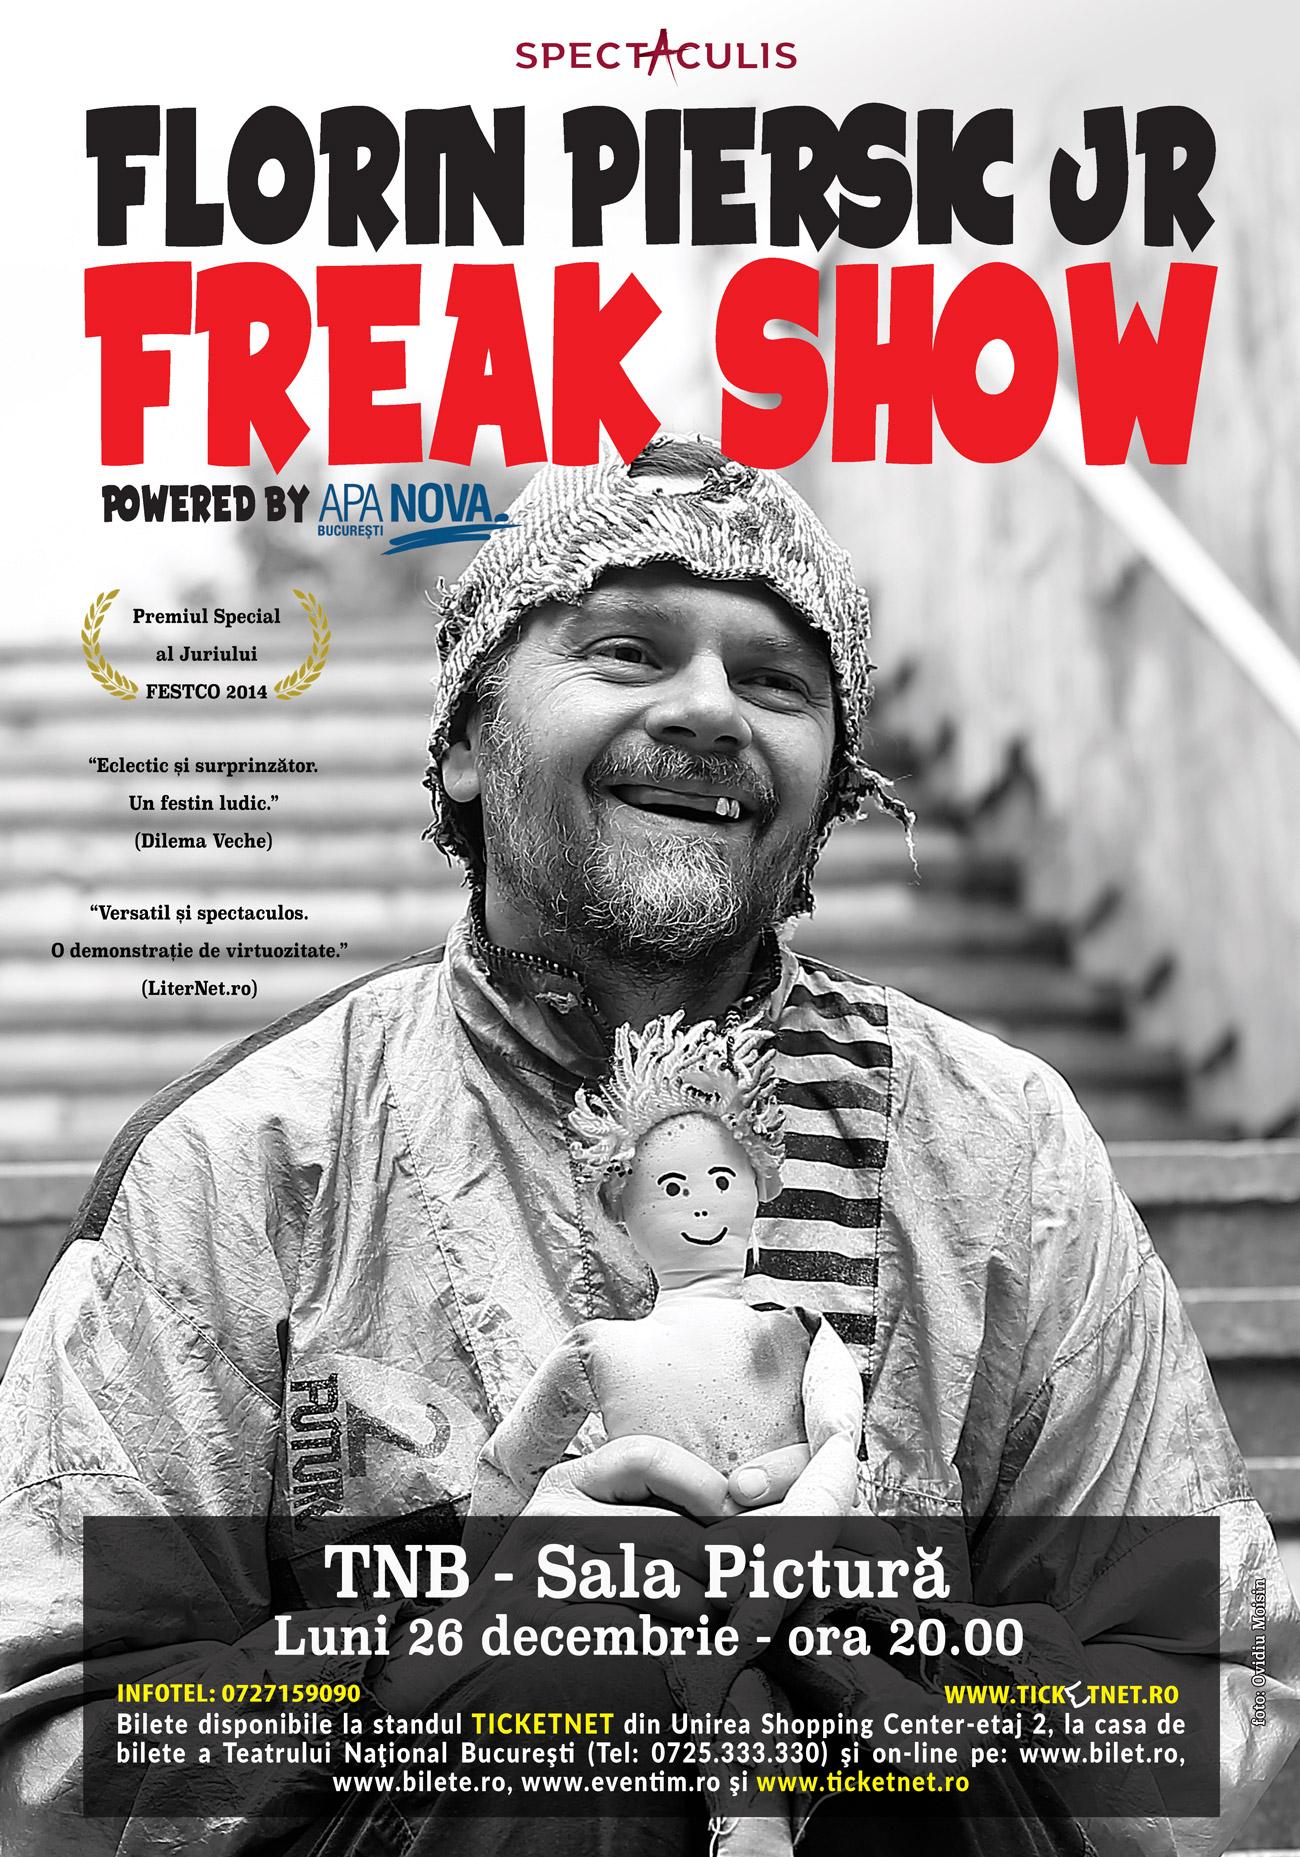 Florin Piersic jr. - Freak show